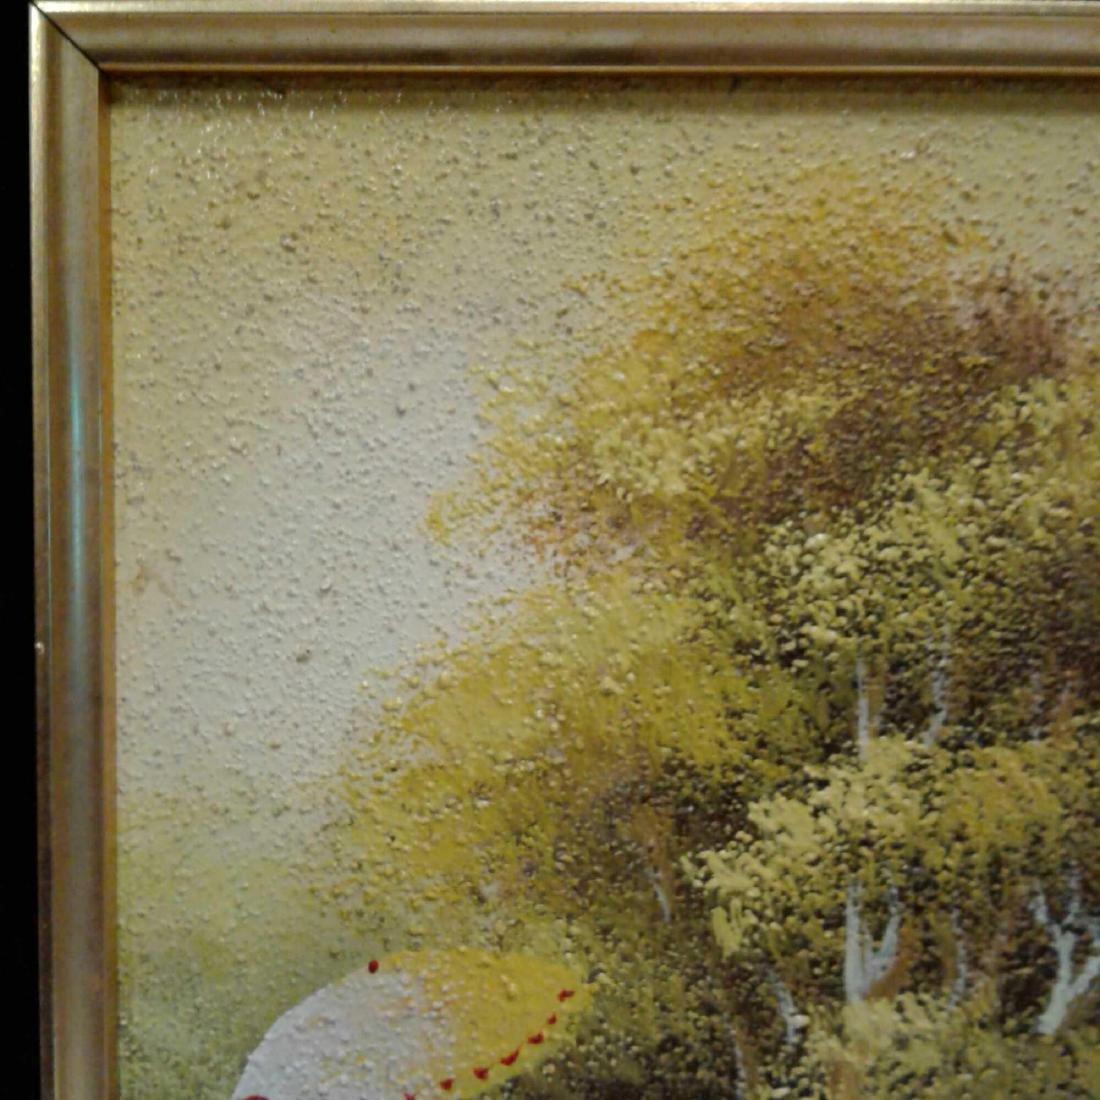 Sandy Grit Textured Impasto Oil Painting - 3